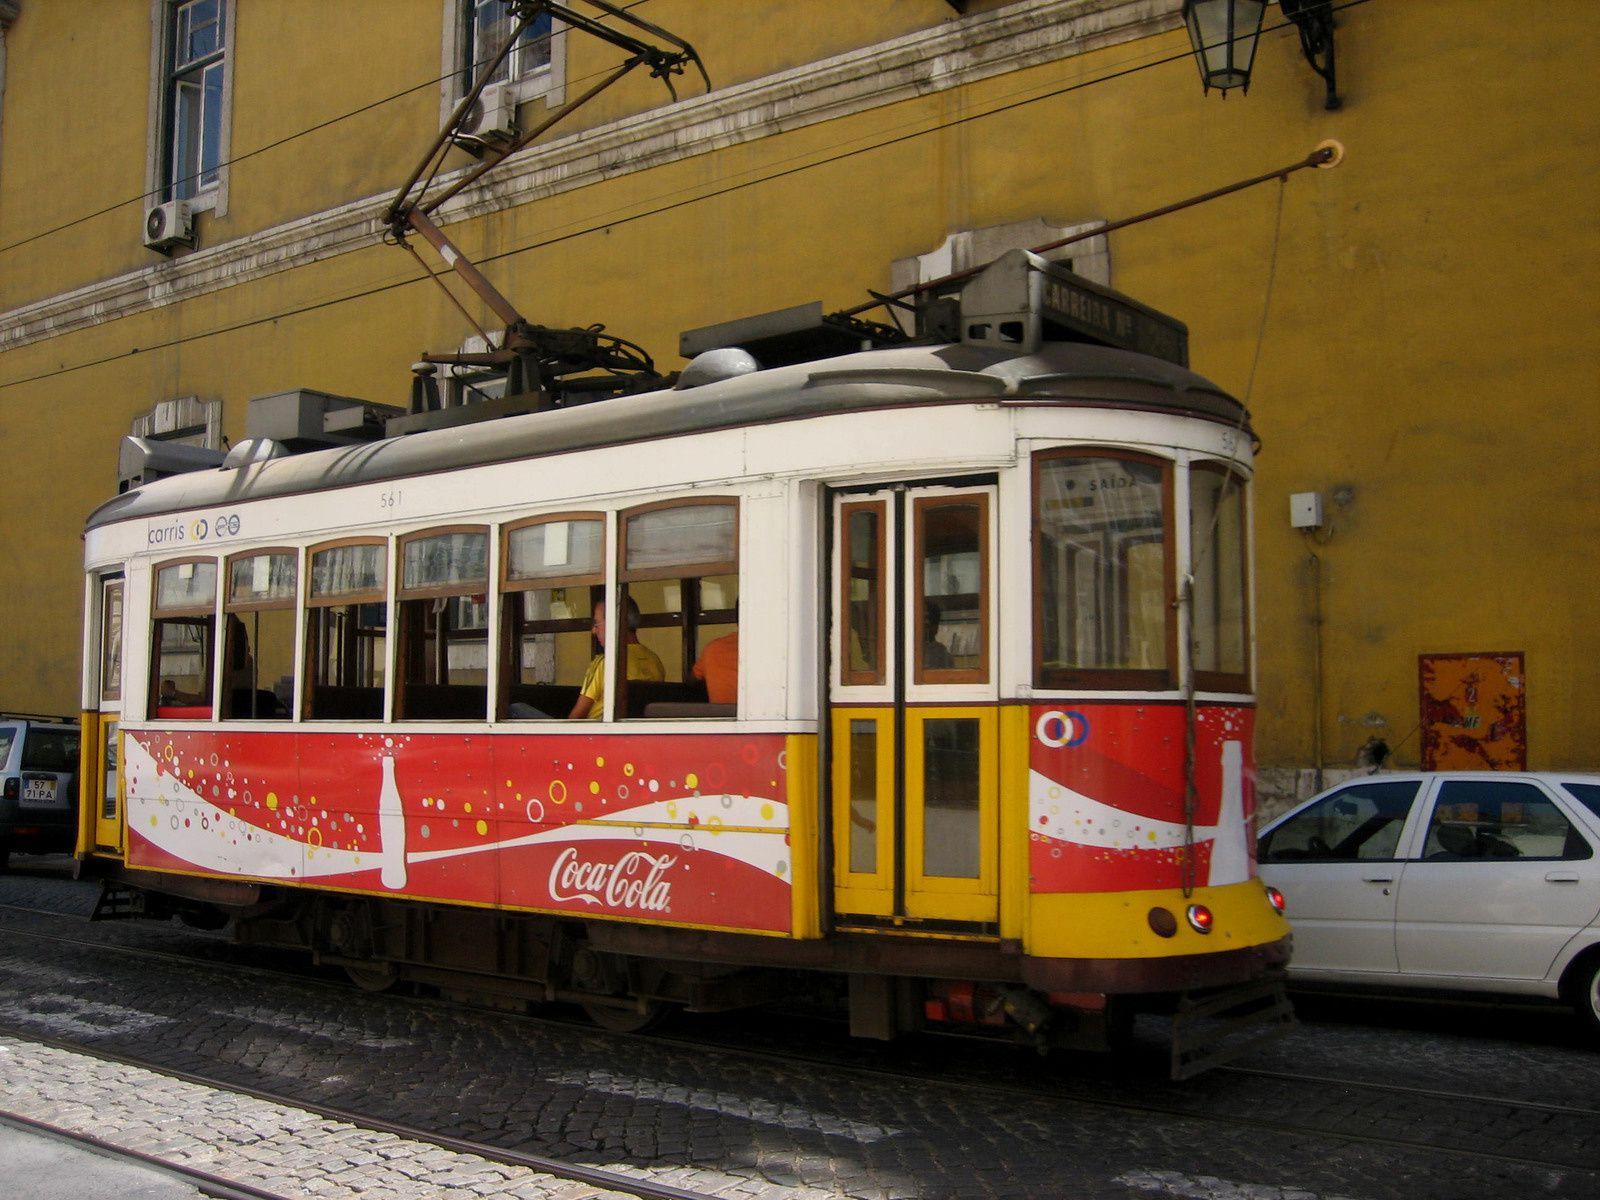 1-Tram / 2- Praça do comercio / 3- elevador permet d'accéder aux hauteurs du quartier de Santa Justa